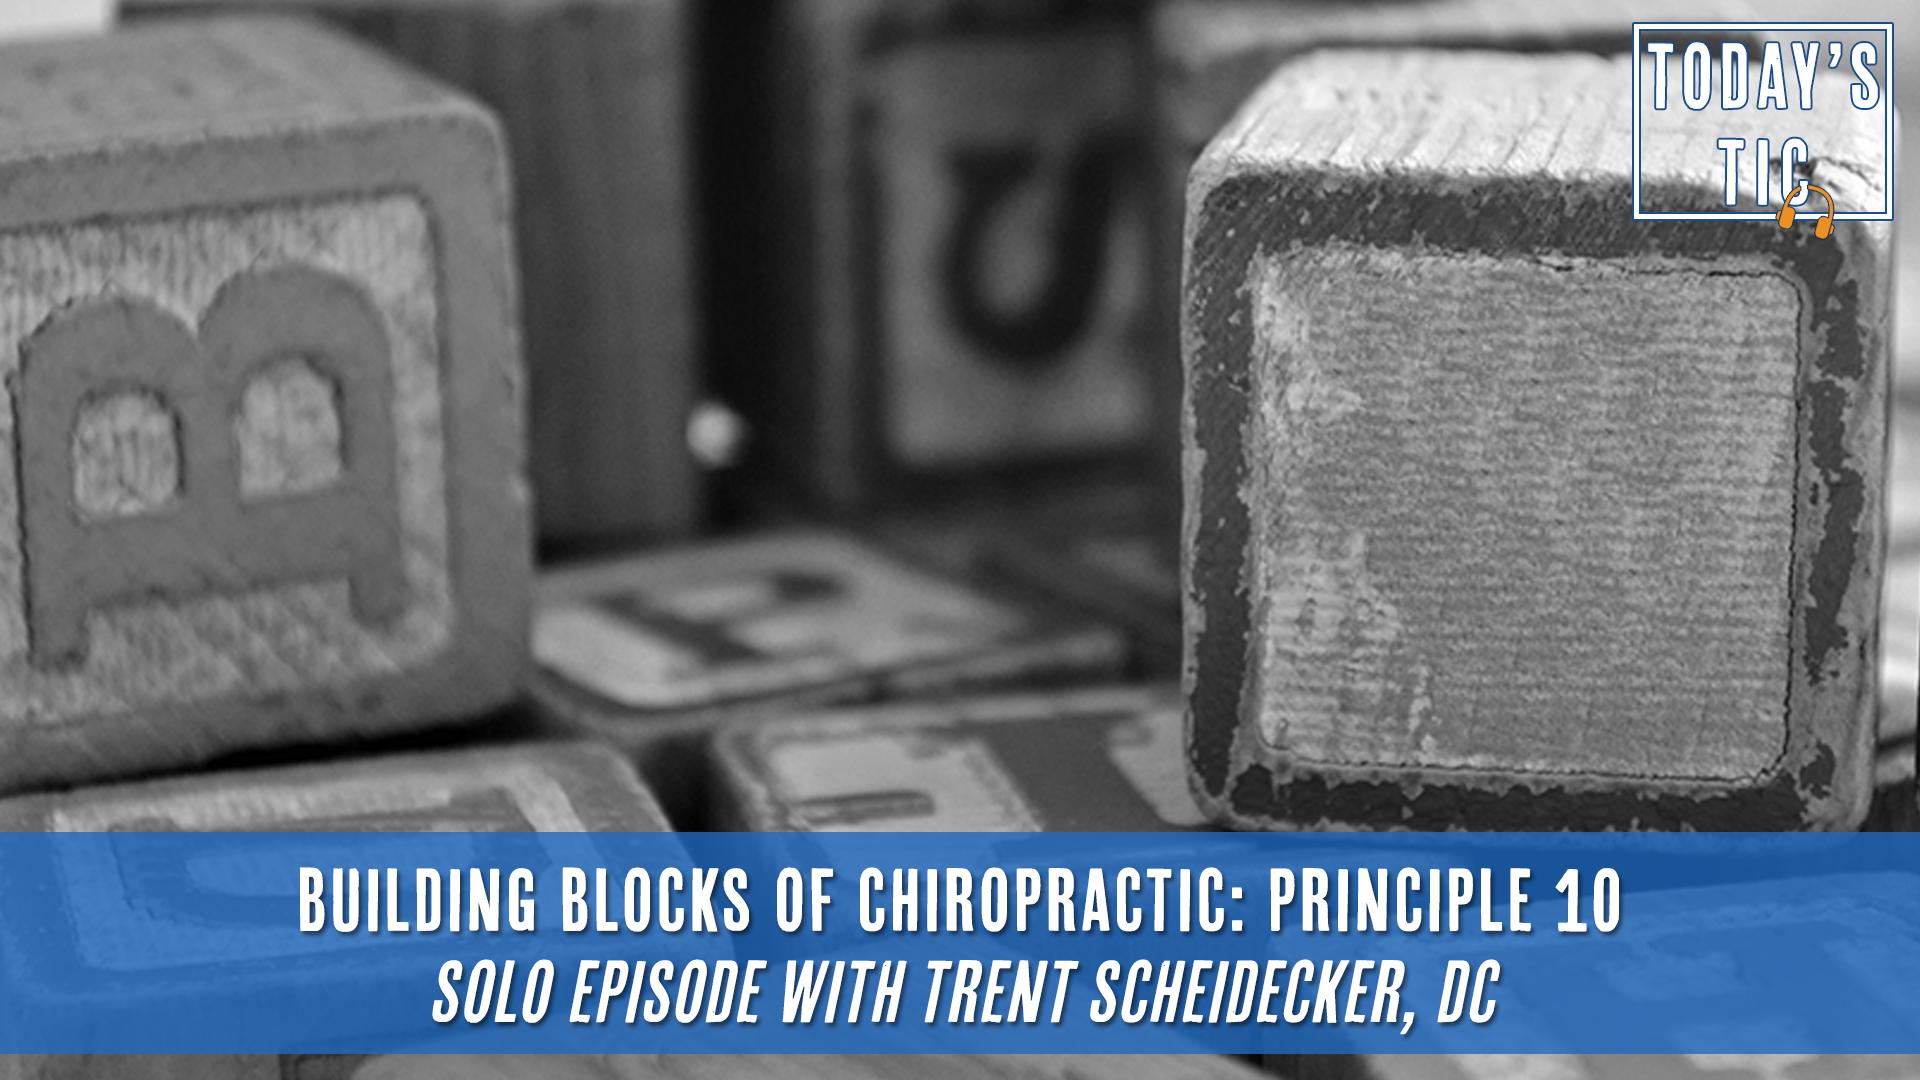 Chiropractic Principle 10